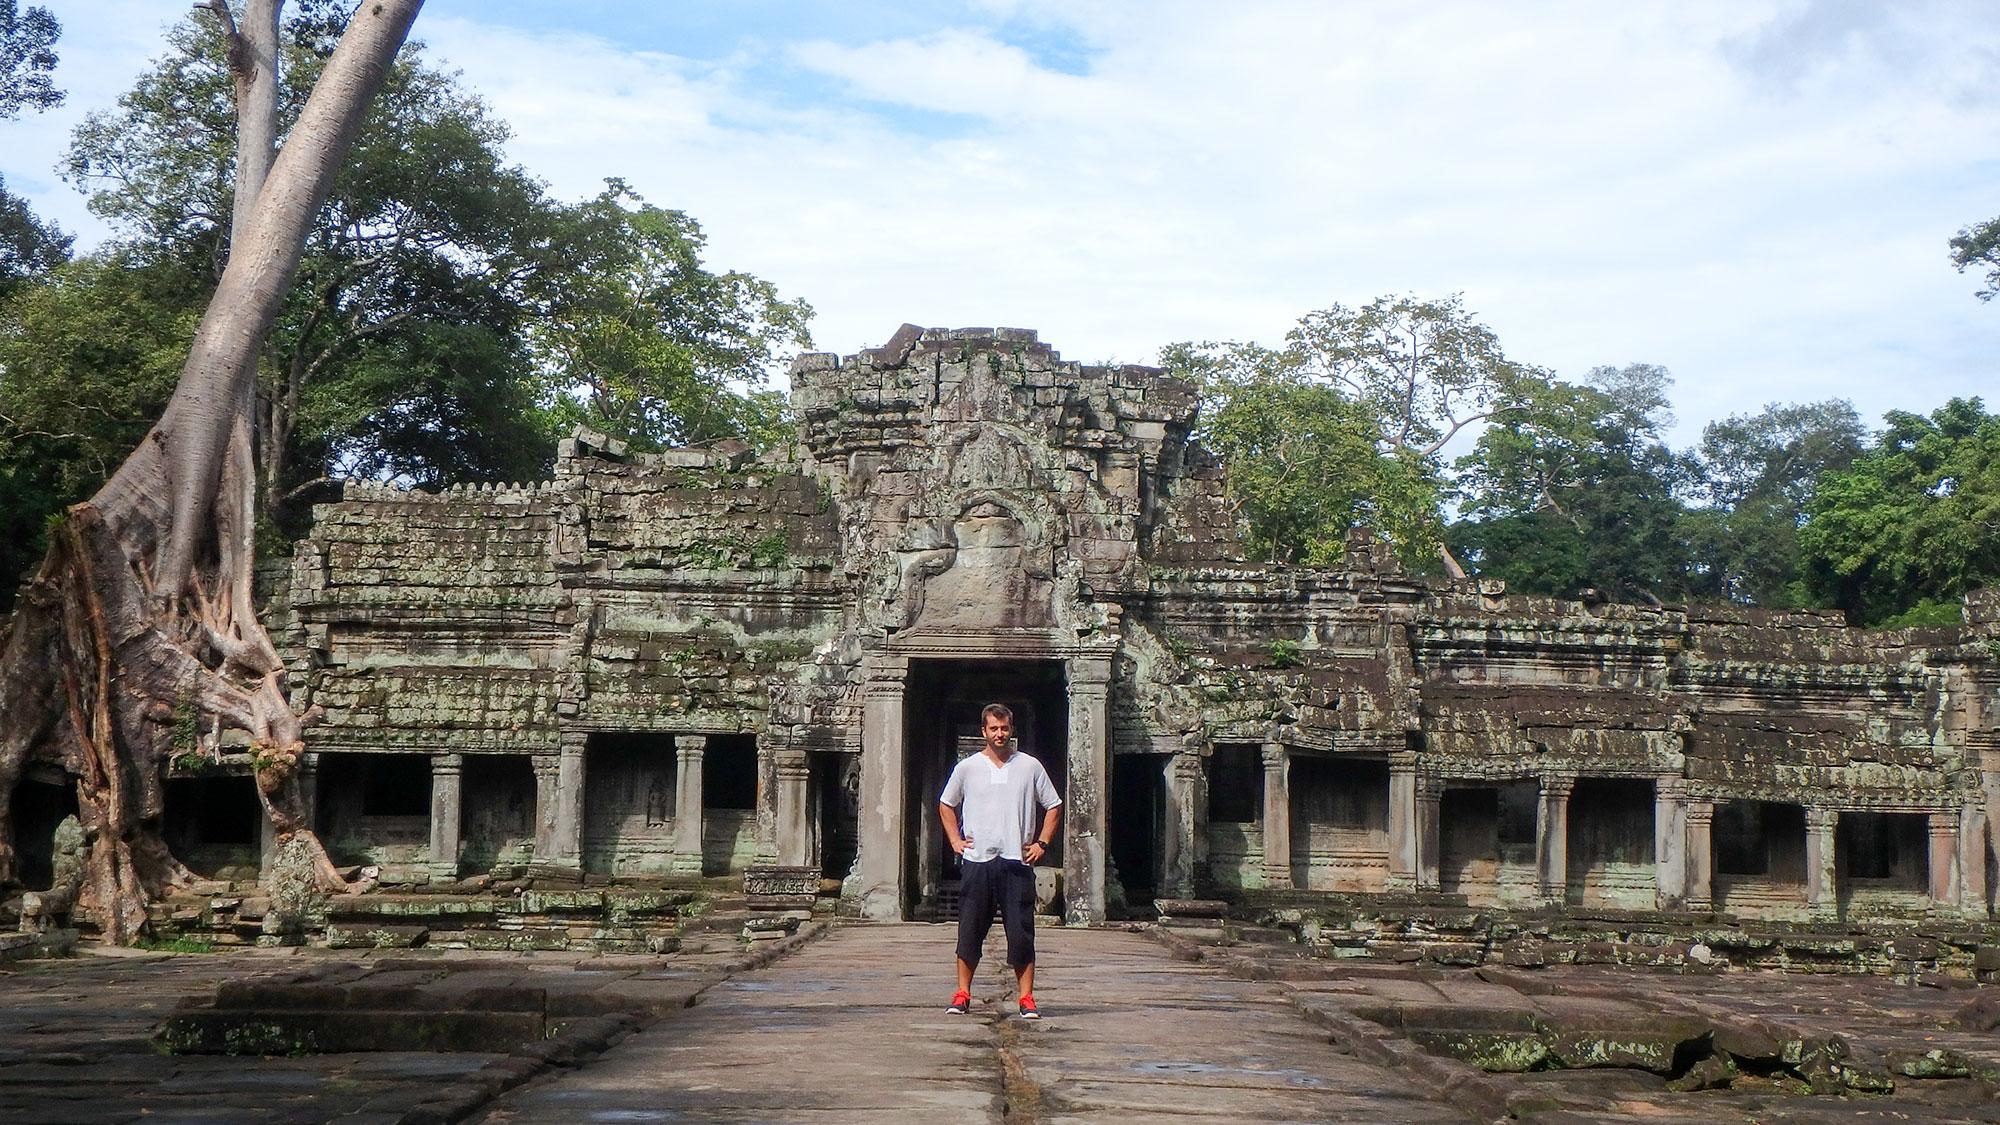 Dan in front of temple